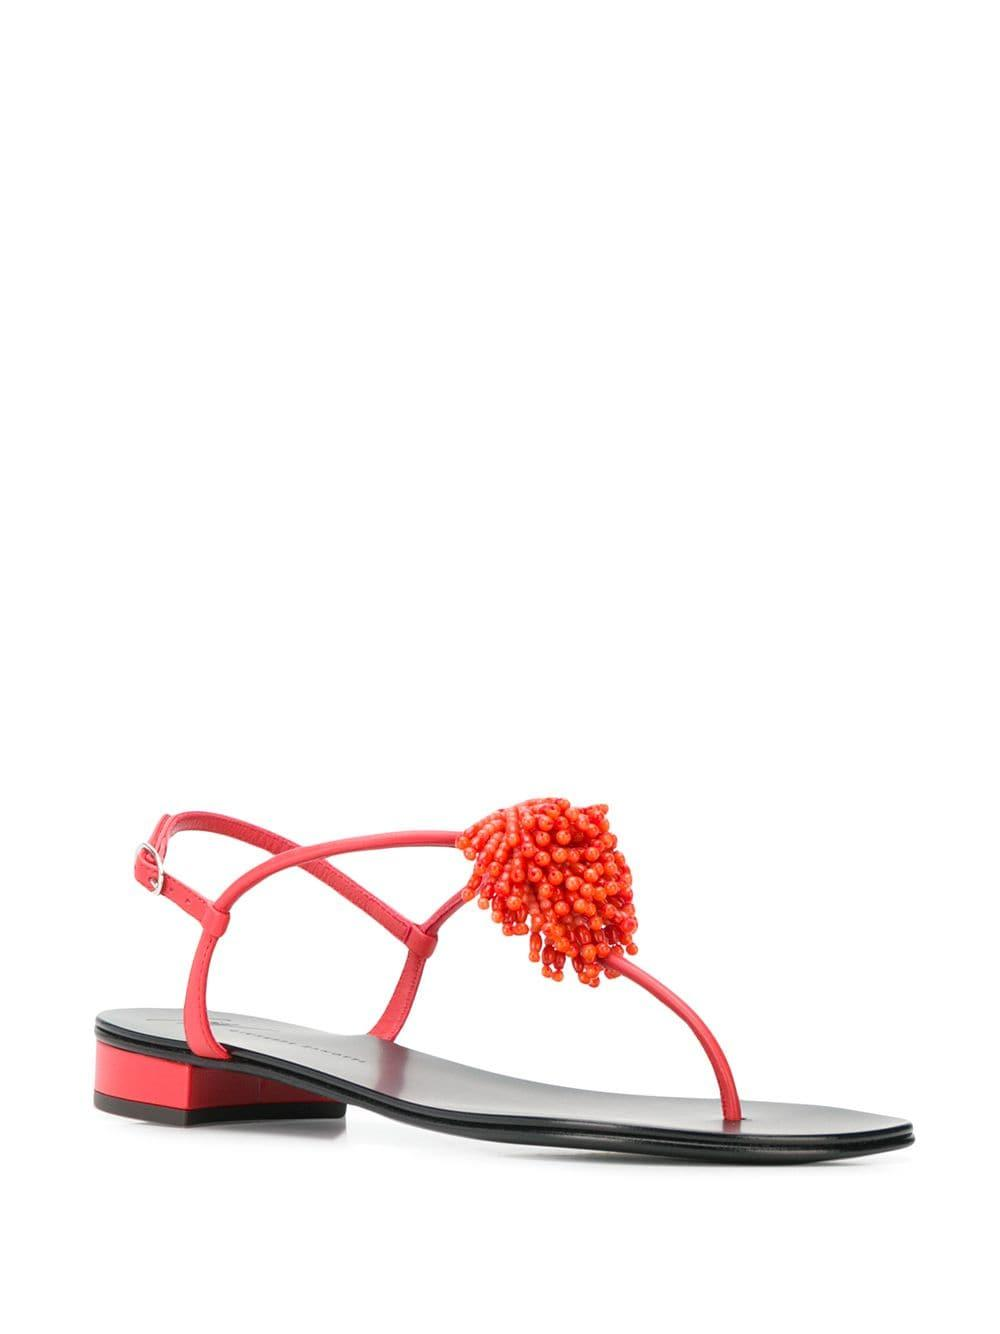 f82988fd7f05 Lyst - Giuseppe Zanotti Flat Flower Sandals in Red